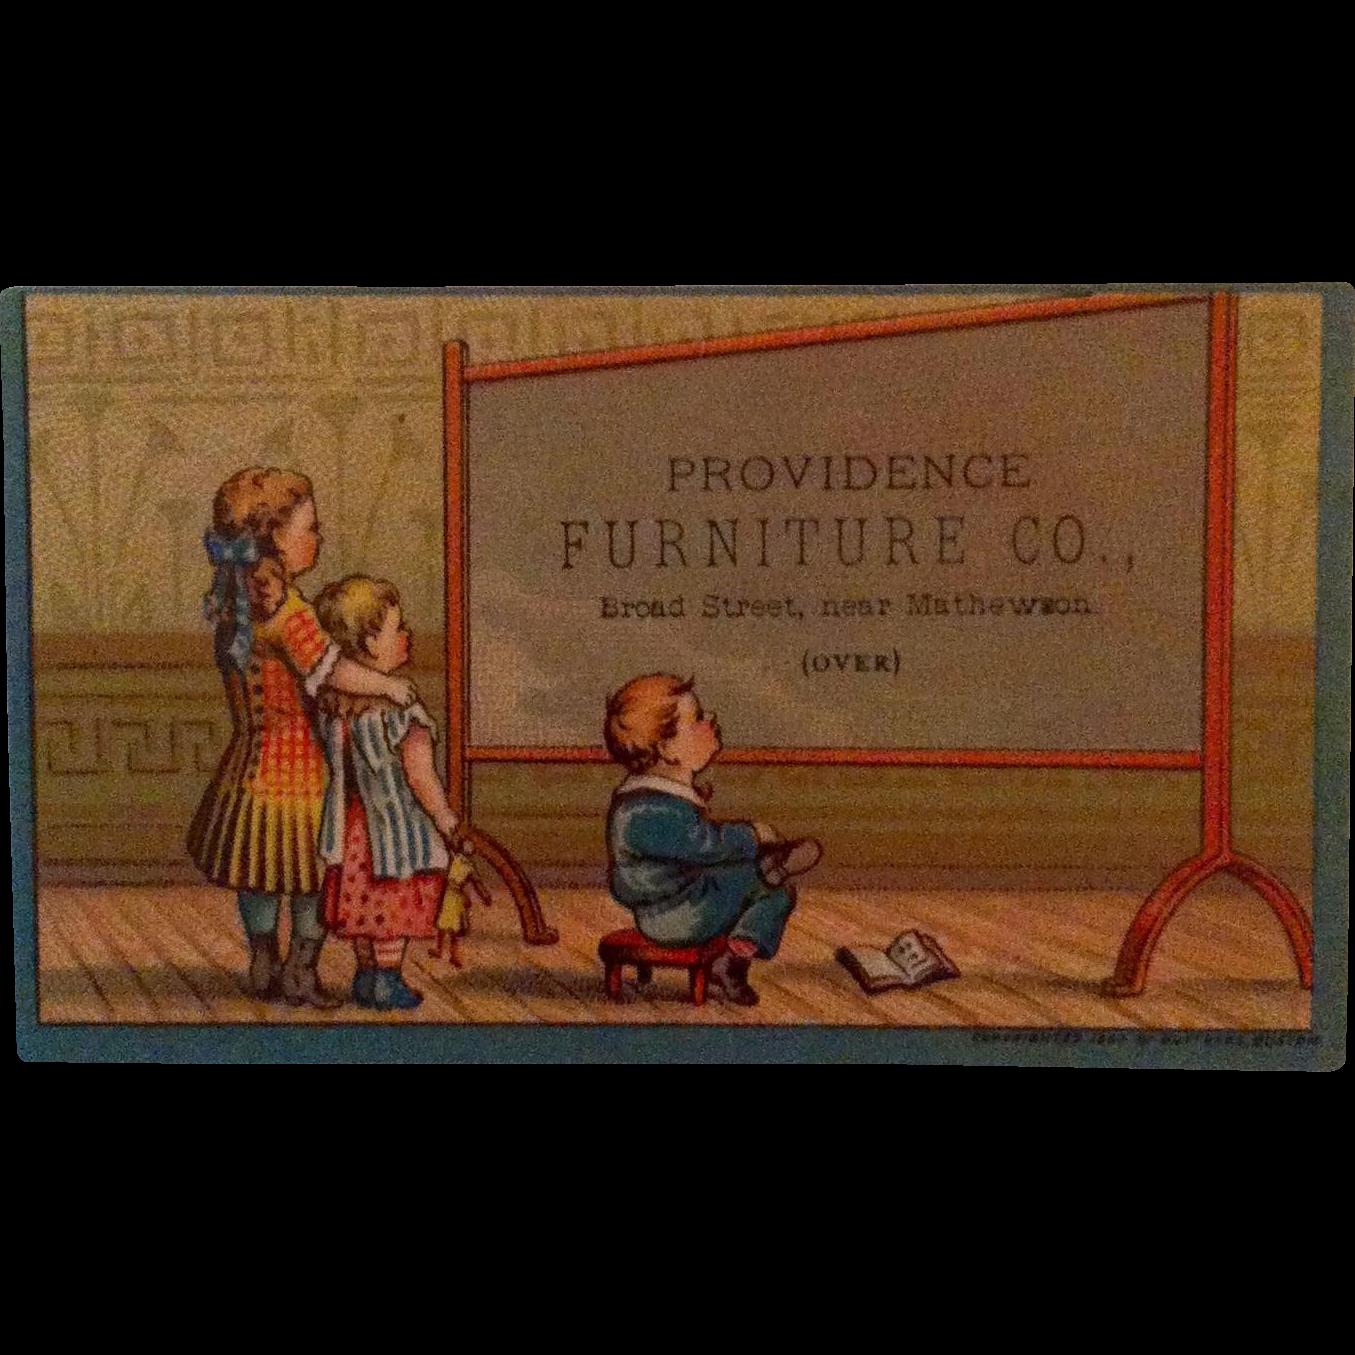 Providence Furniture Advertising Trade Card 1880